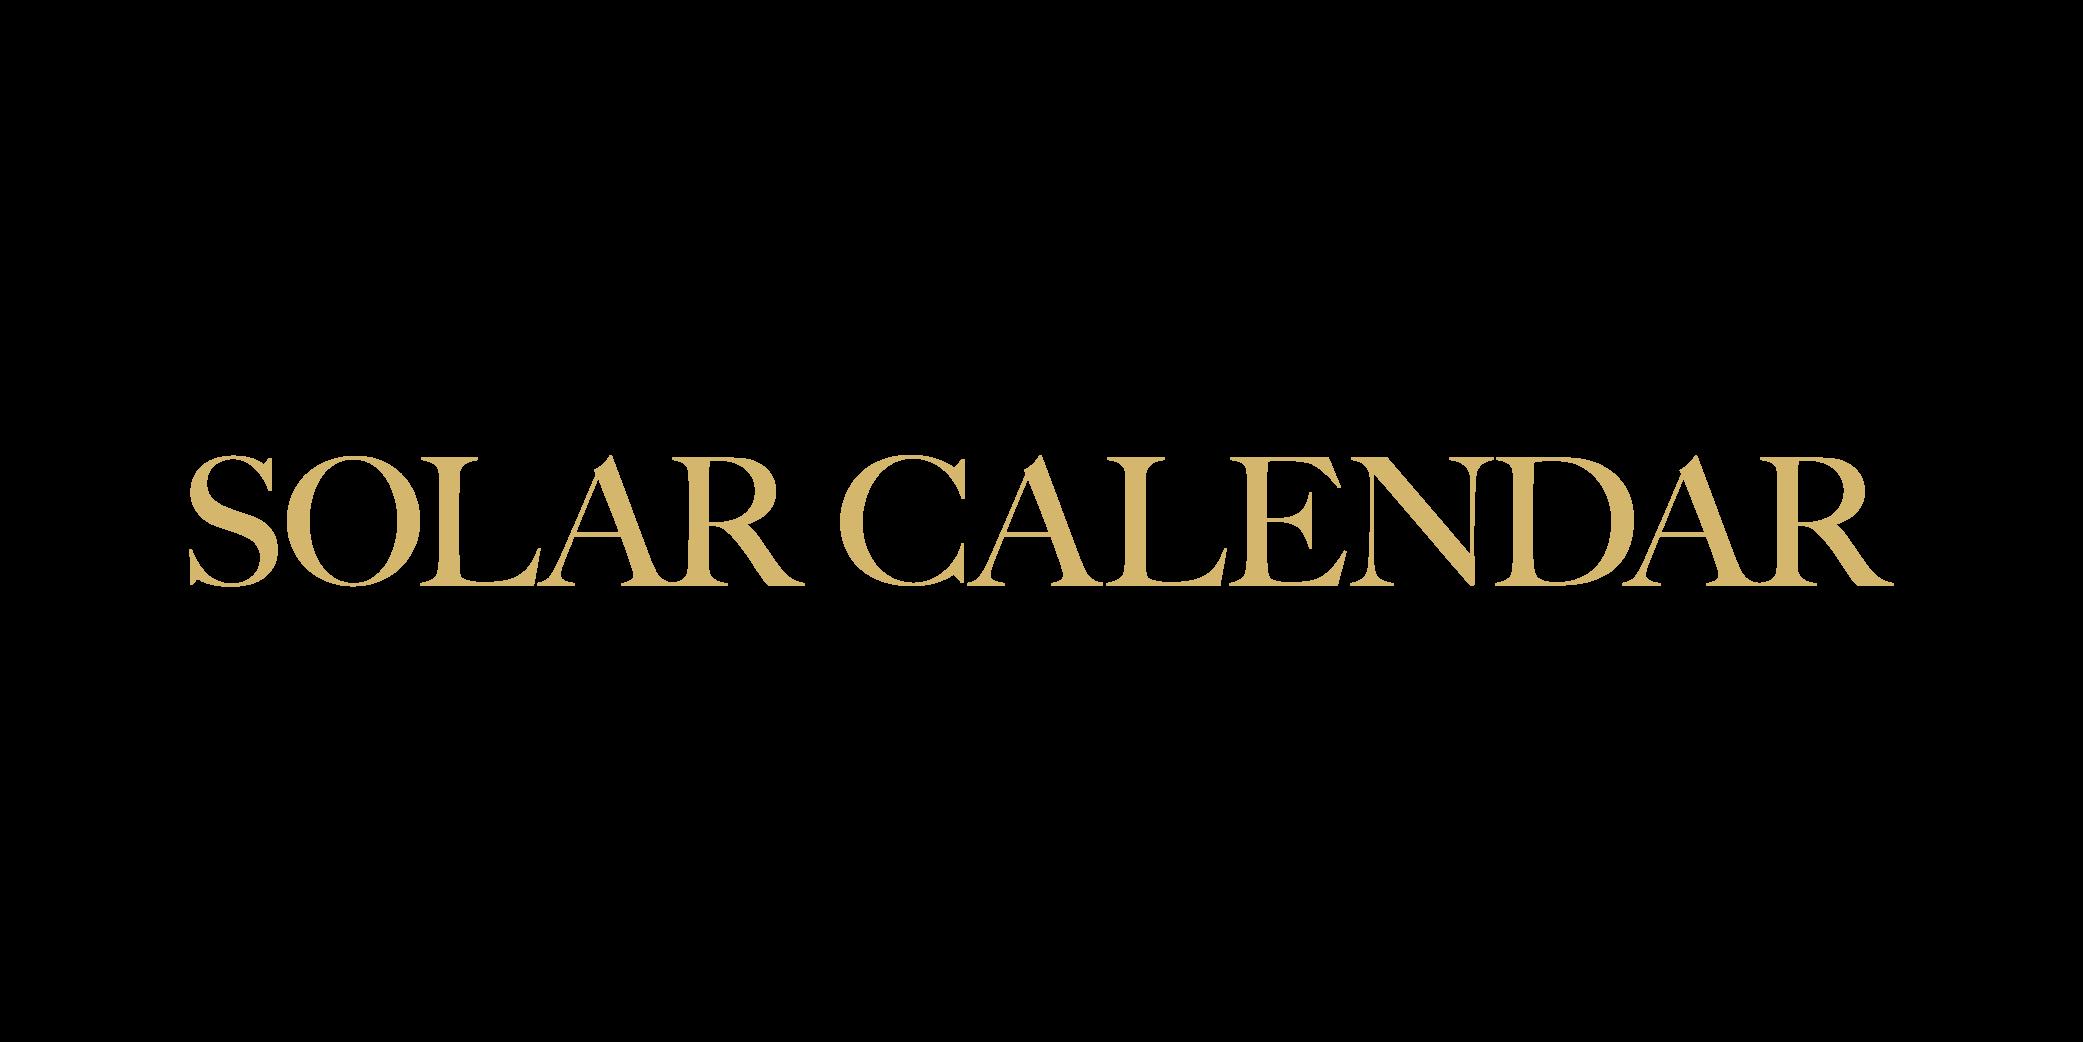 solar-typogrpahy-05